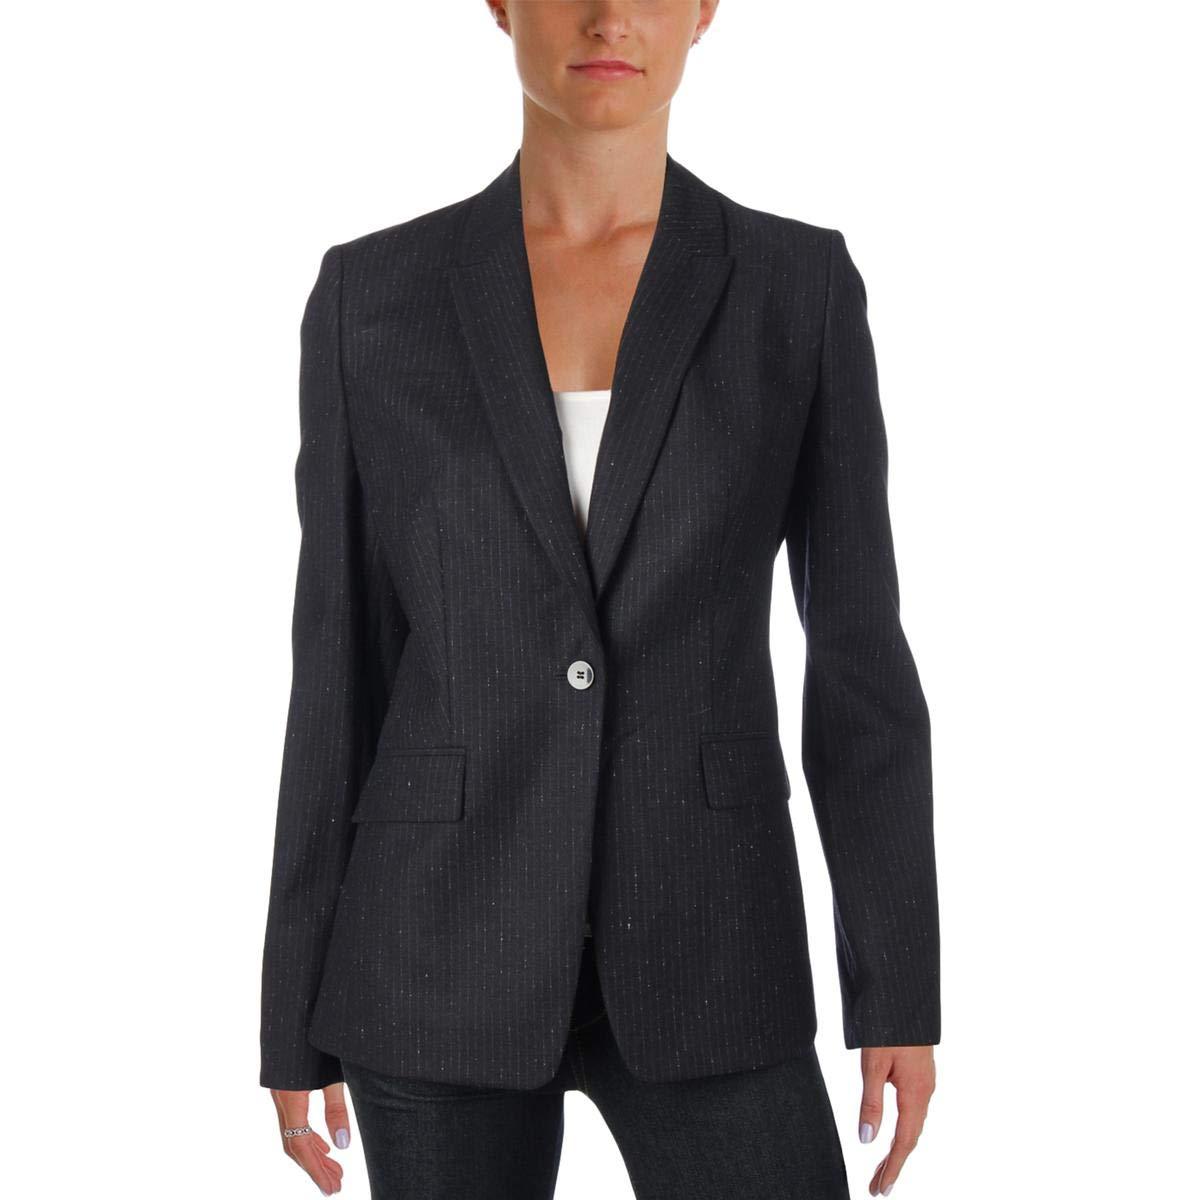 83b37e17c Hugo Boss BOSS Womens Jeronala Pinstripe Business Blazer Black 10 at Amazon  Women's Clothing store: